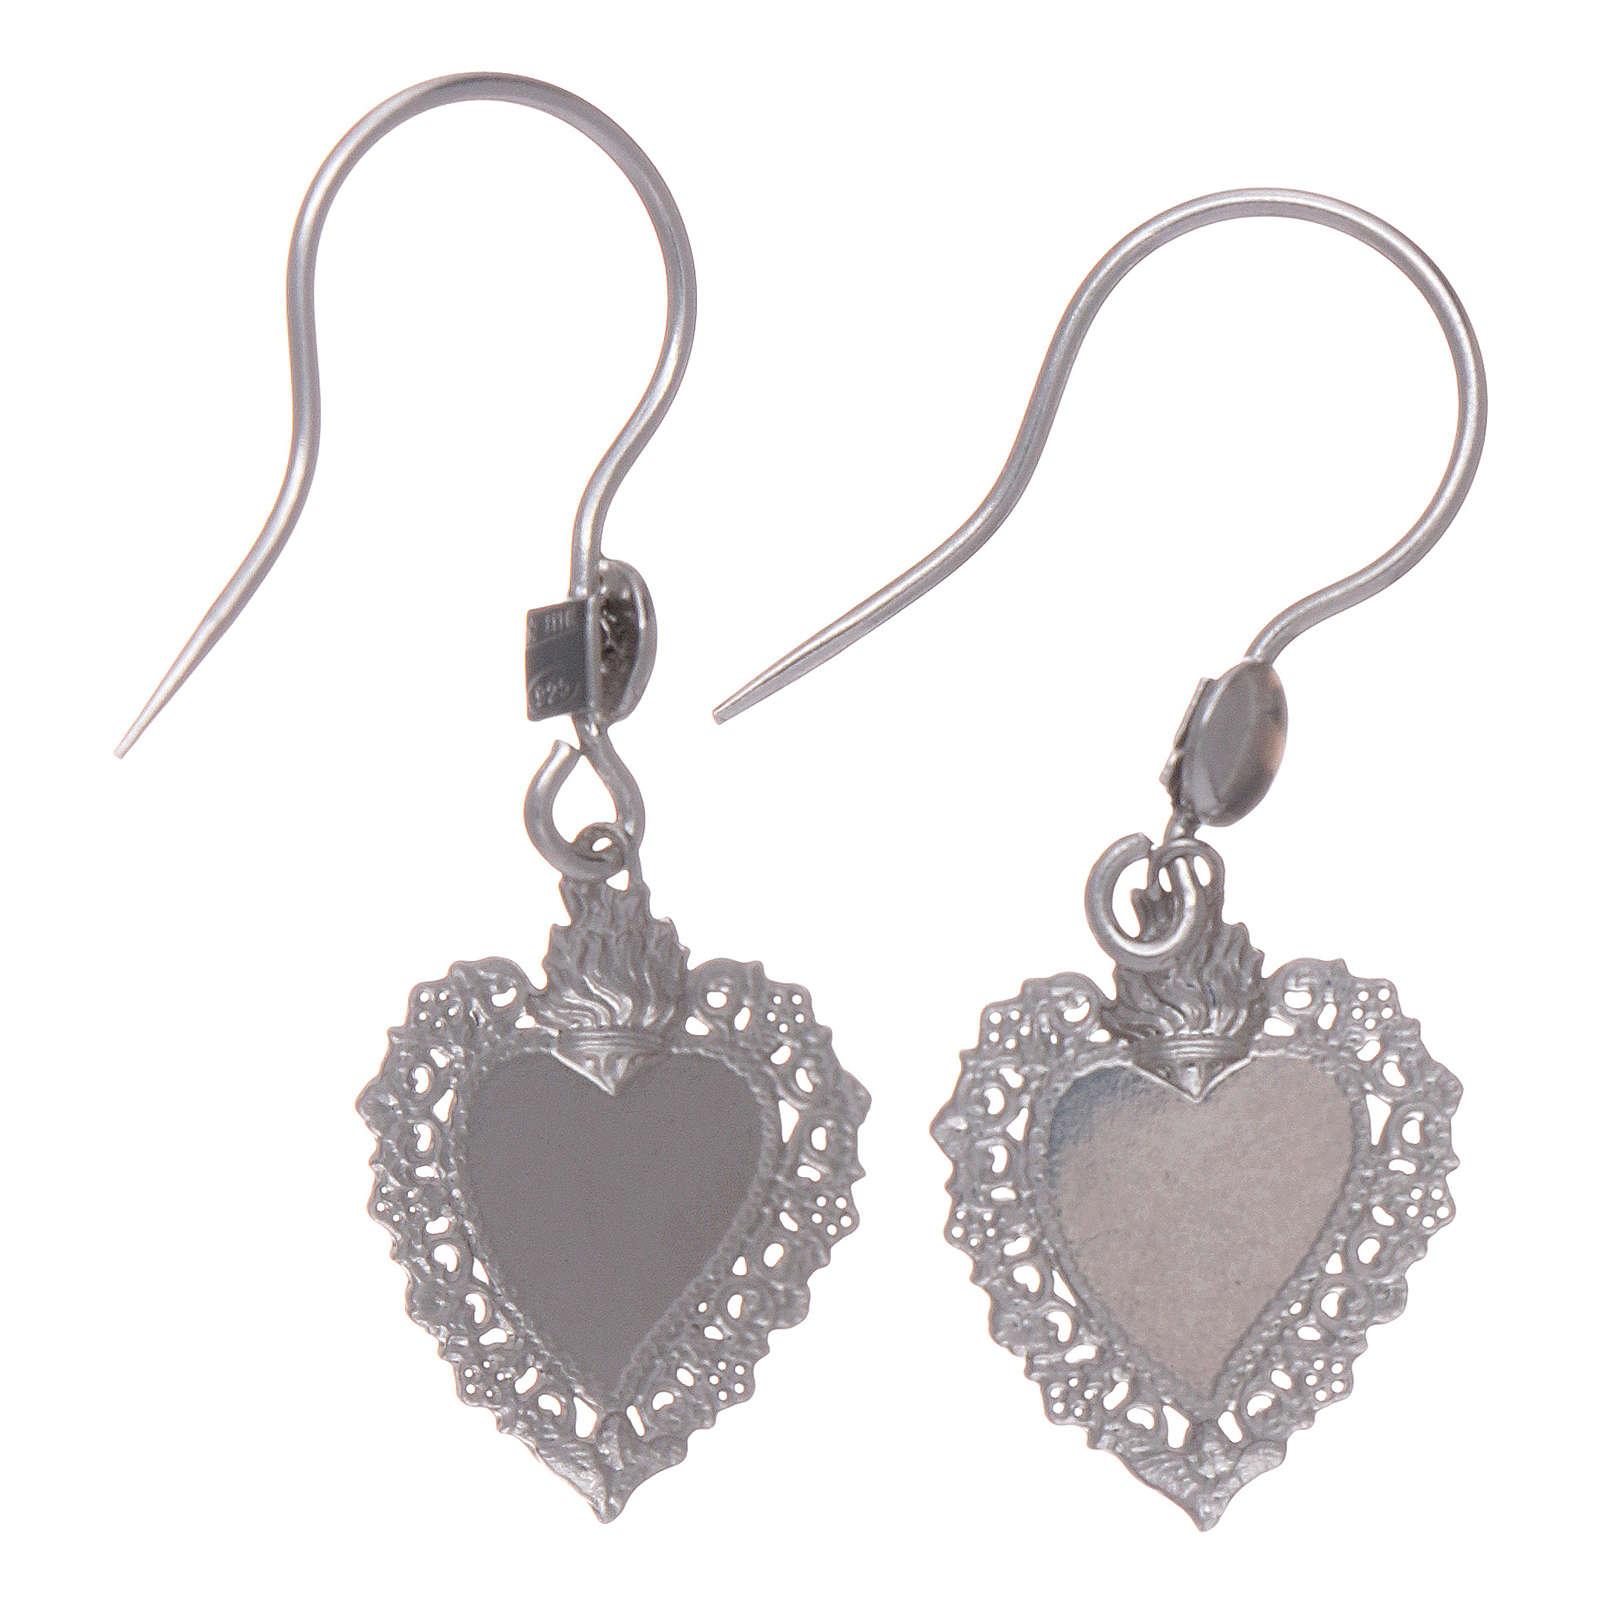 Sterling silver earrings with votive heart 4